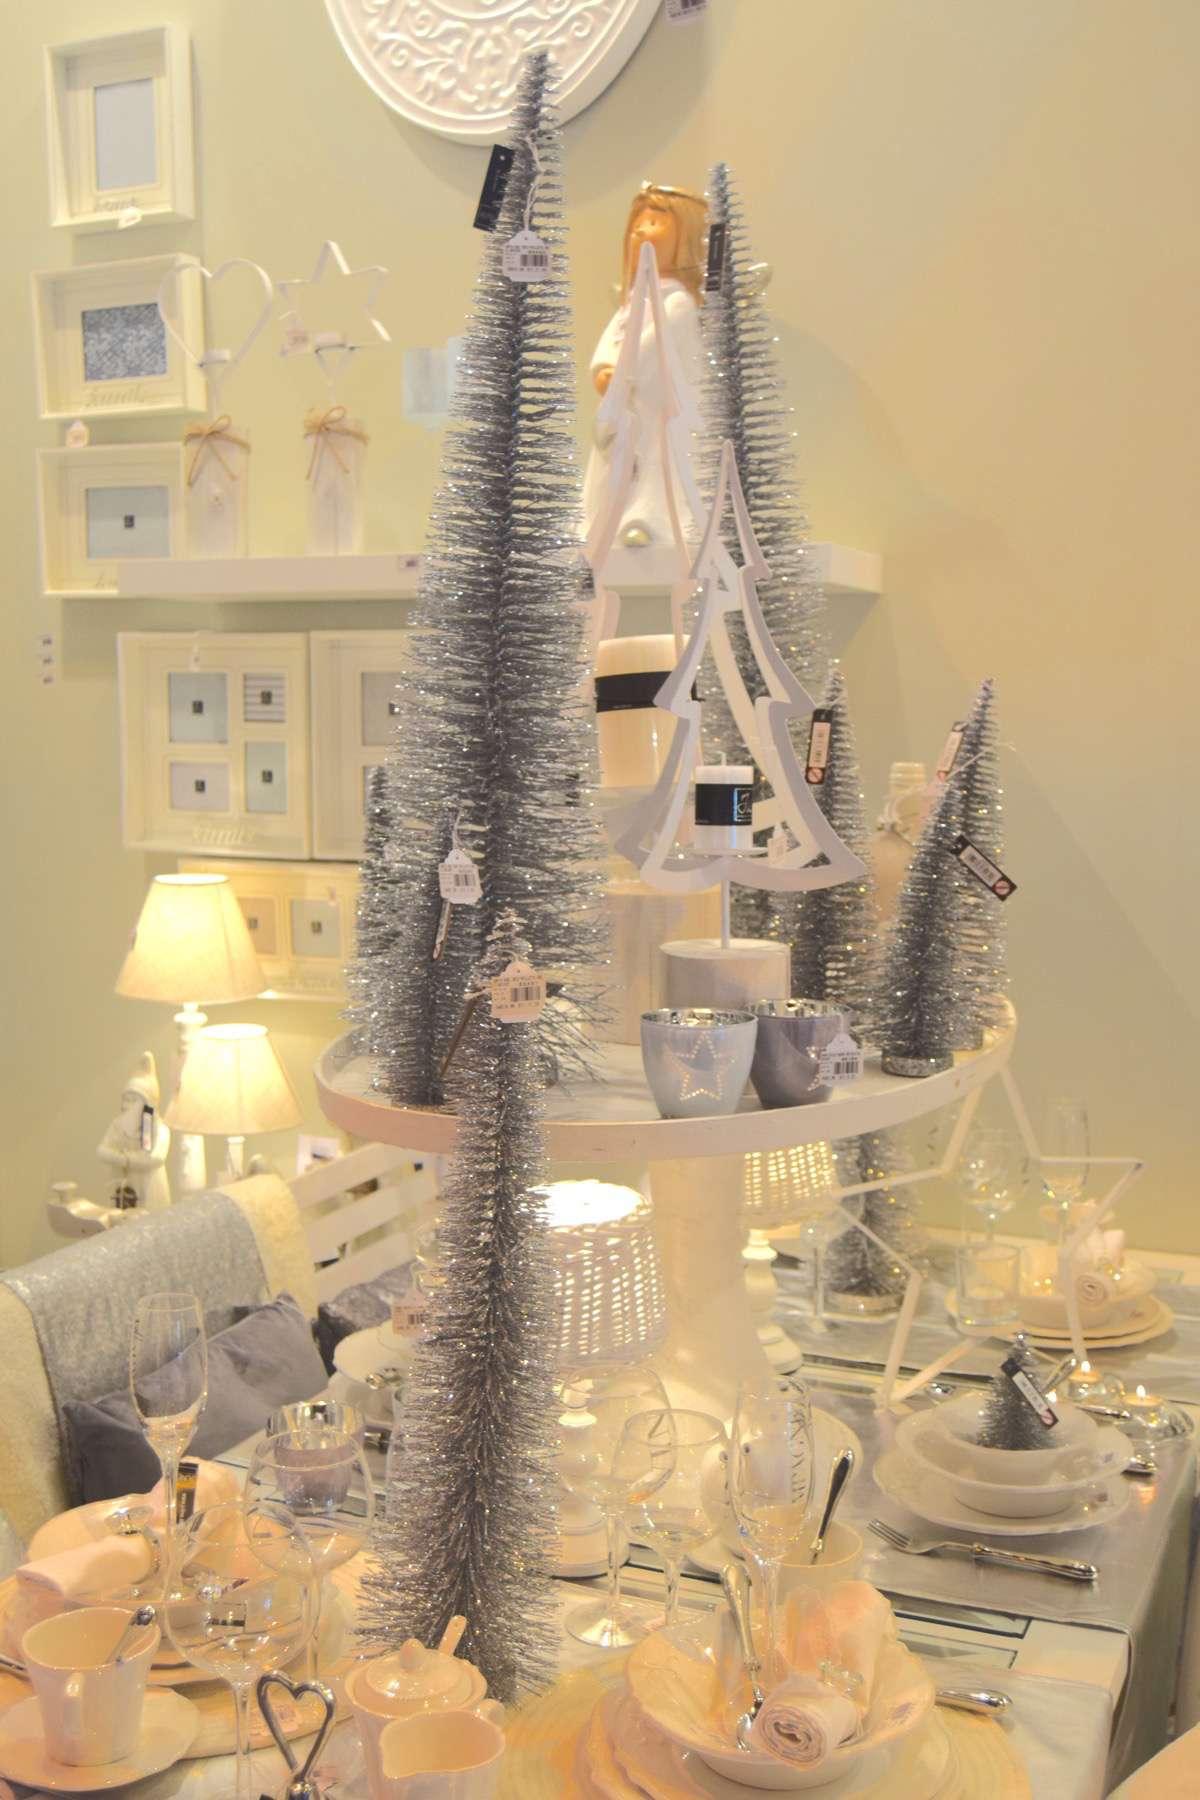 "13-original-Christmas-trees ""width ="" 1200 ""height ="" 1800 ""srcset ="" https://navidad.es/wp-content/uploads/2009/12/13-arboles-de-navidad-originales .jpg 1200w, https://navidad.es/wp-content/uploads/2009/12/13-arboles-de-navidad-originales-200x300.jpg 200w, https://navidad.es/wp-content/uploads /2009/12/13-arboles-de-navidad-originales-768x1152.jpg 768w, https://navidad.es/wp-content/uploads/2009/12/13-arboles-de-navidad-originales-683x1024. jpg 683w, https://navidad.es/wp-content/uploads/2009/12/13-arboles-de-navidad-originales-696x1044.jpg 696w, https://navidad.es/wp-content/uploads/ 2009/12/13-original-Christmas-trees-1068x1602.jpg 1068w, https://navidad.es/wp-content/uploads/2009/12/13-arboles-de-navidad-originales-280x420.jpg 280w ""tailles ="" (largeur maximale: 1200px) 100vw, 1200px ""/></p> <h2><span class="